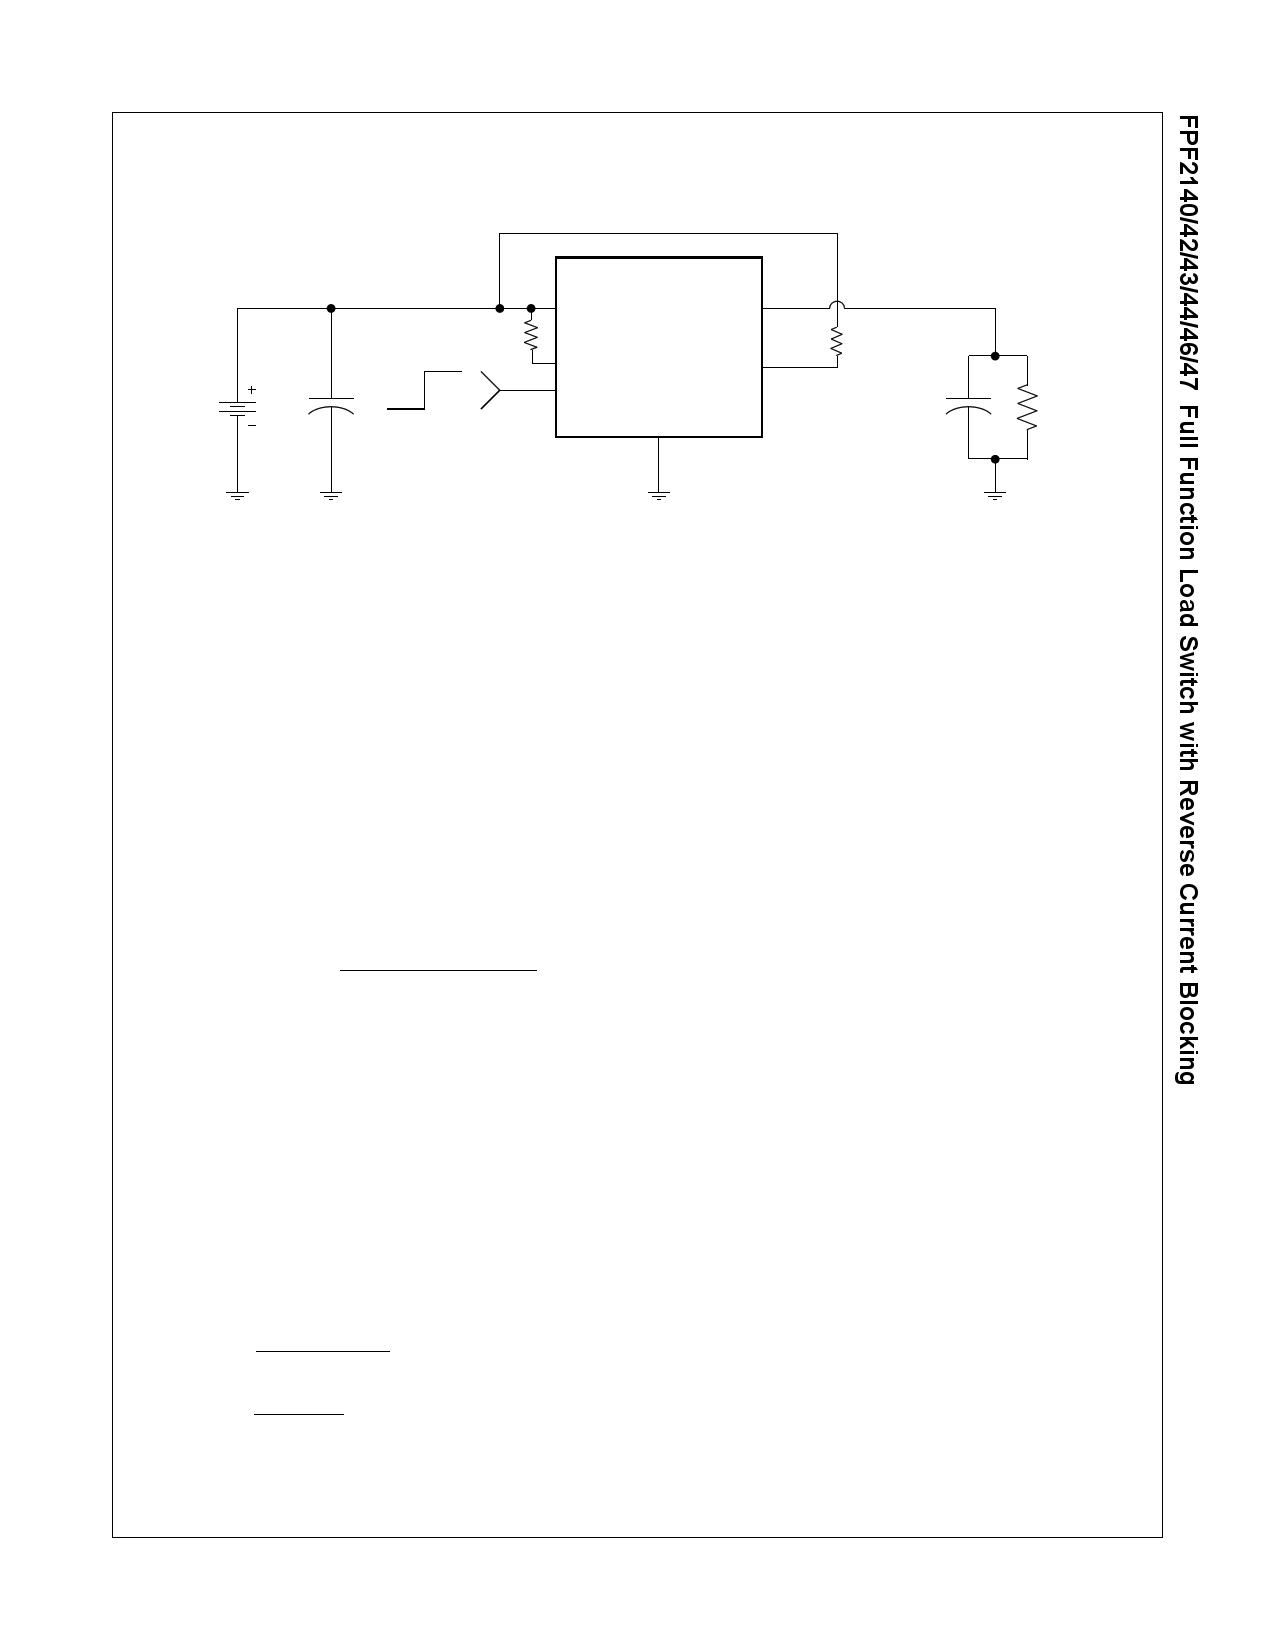 FPF2140 arduino